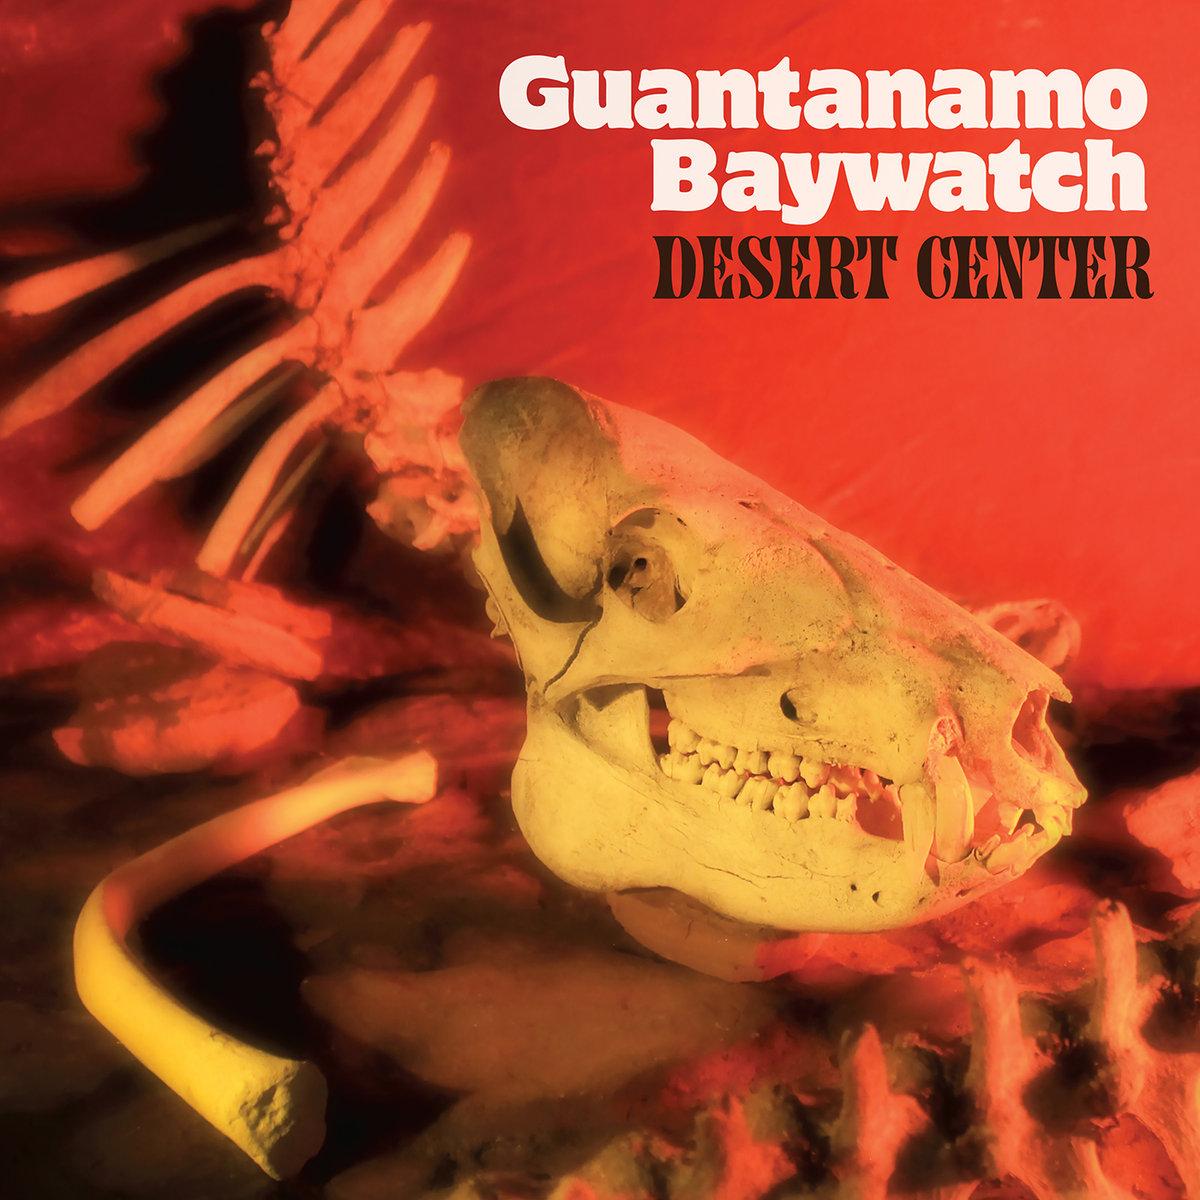 Guantanamo Baywatch – desert center